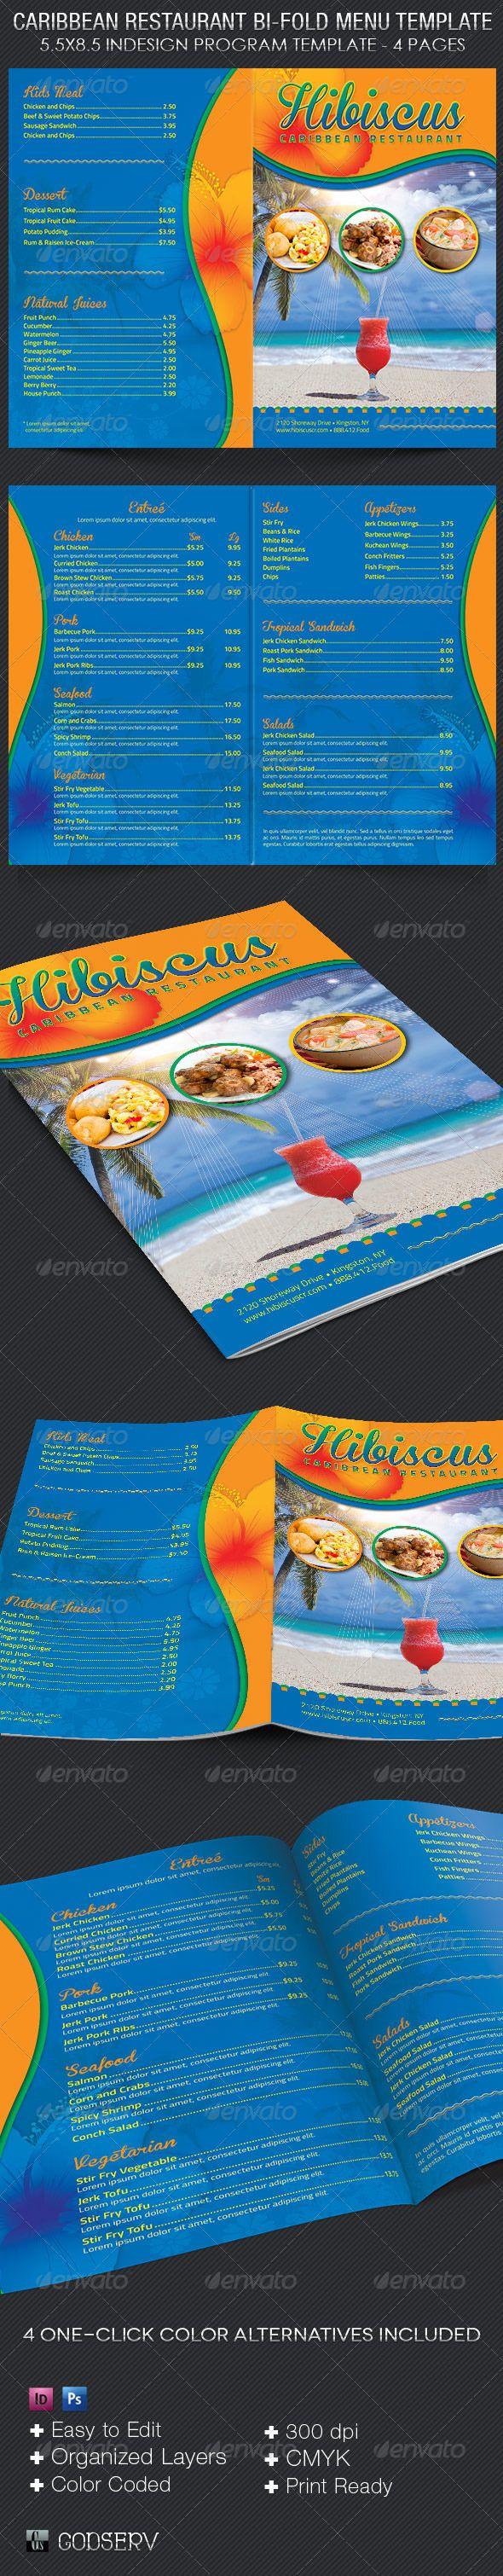 Caribbean Restaurant Bi-fold Menu Template #design #speisekarte Download: http://graphicriver.net/item/caribbean-restaurant-bifold-menu-template/8089519?ref=ksioks